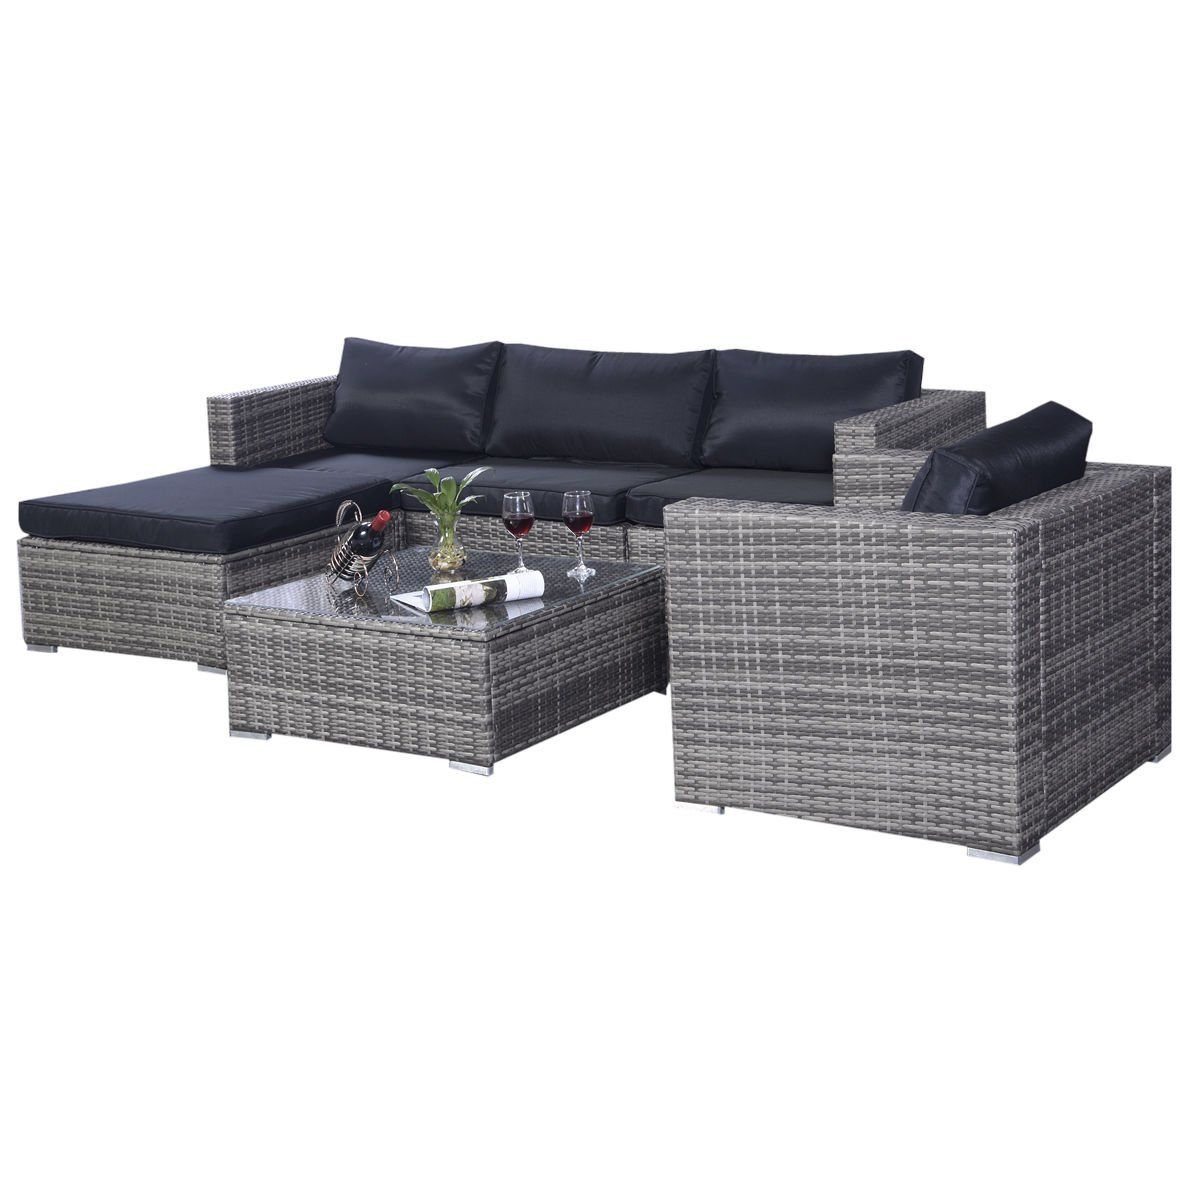 Amazon Com Tangkula 6 Pcs Outdoor Wicker Furniture Set 400 x 300